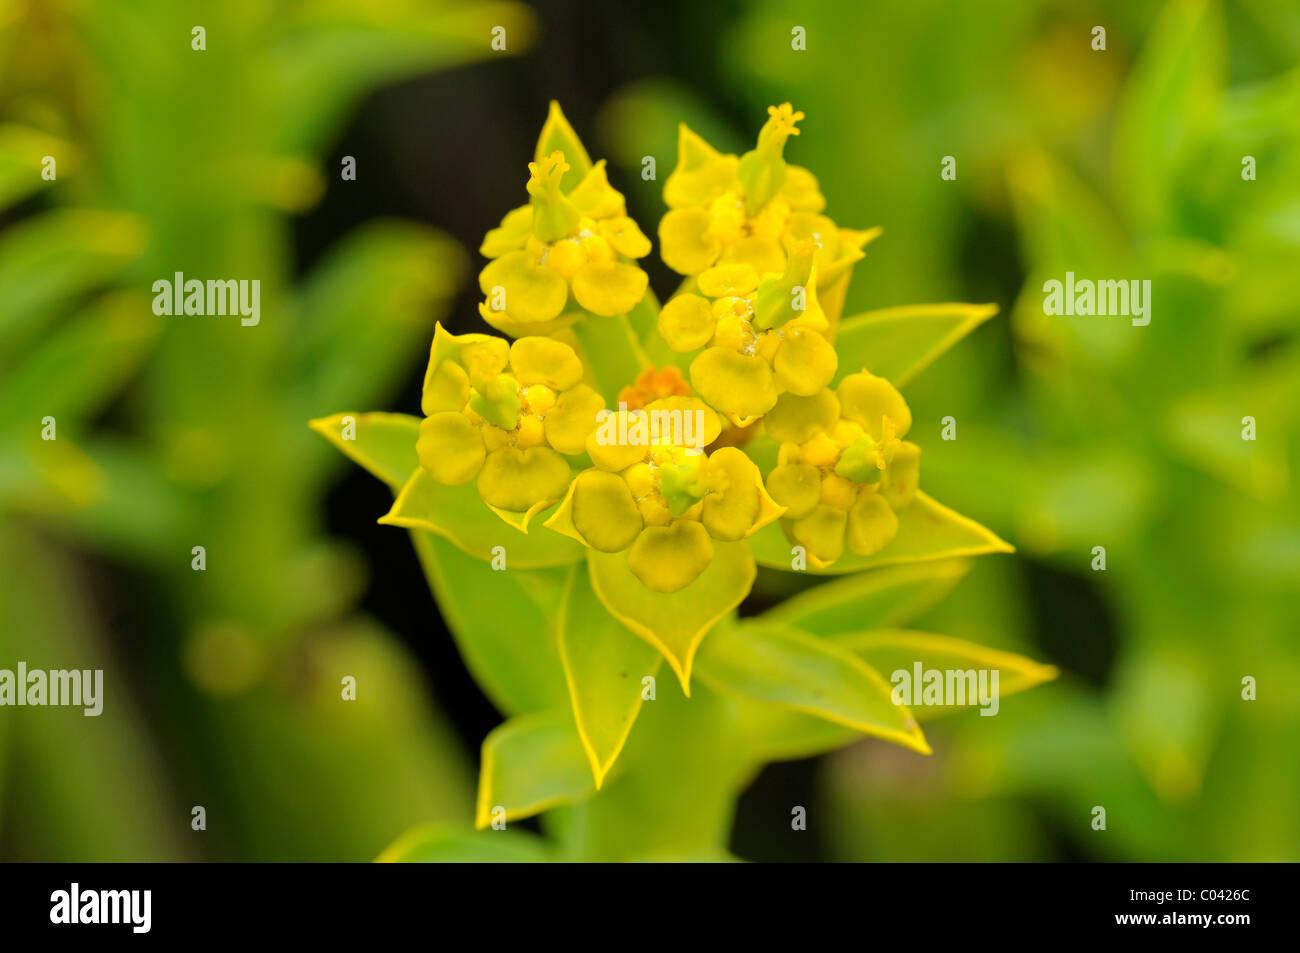 Euphorbia mauretanica, Gifmelkbos, Richtersveld, South Africa Stock Photo